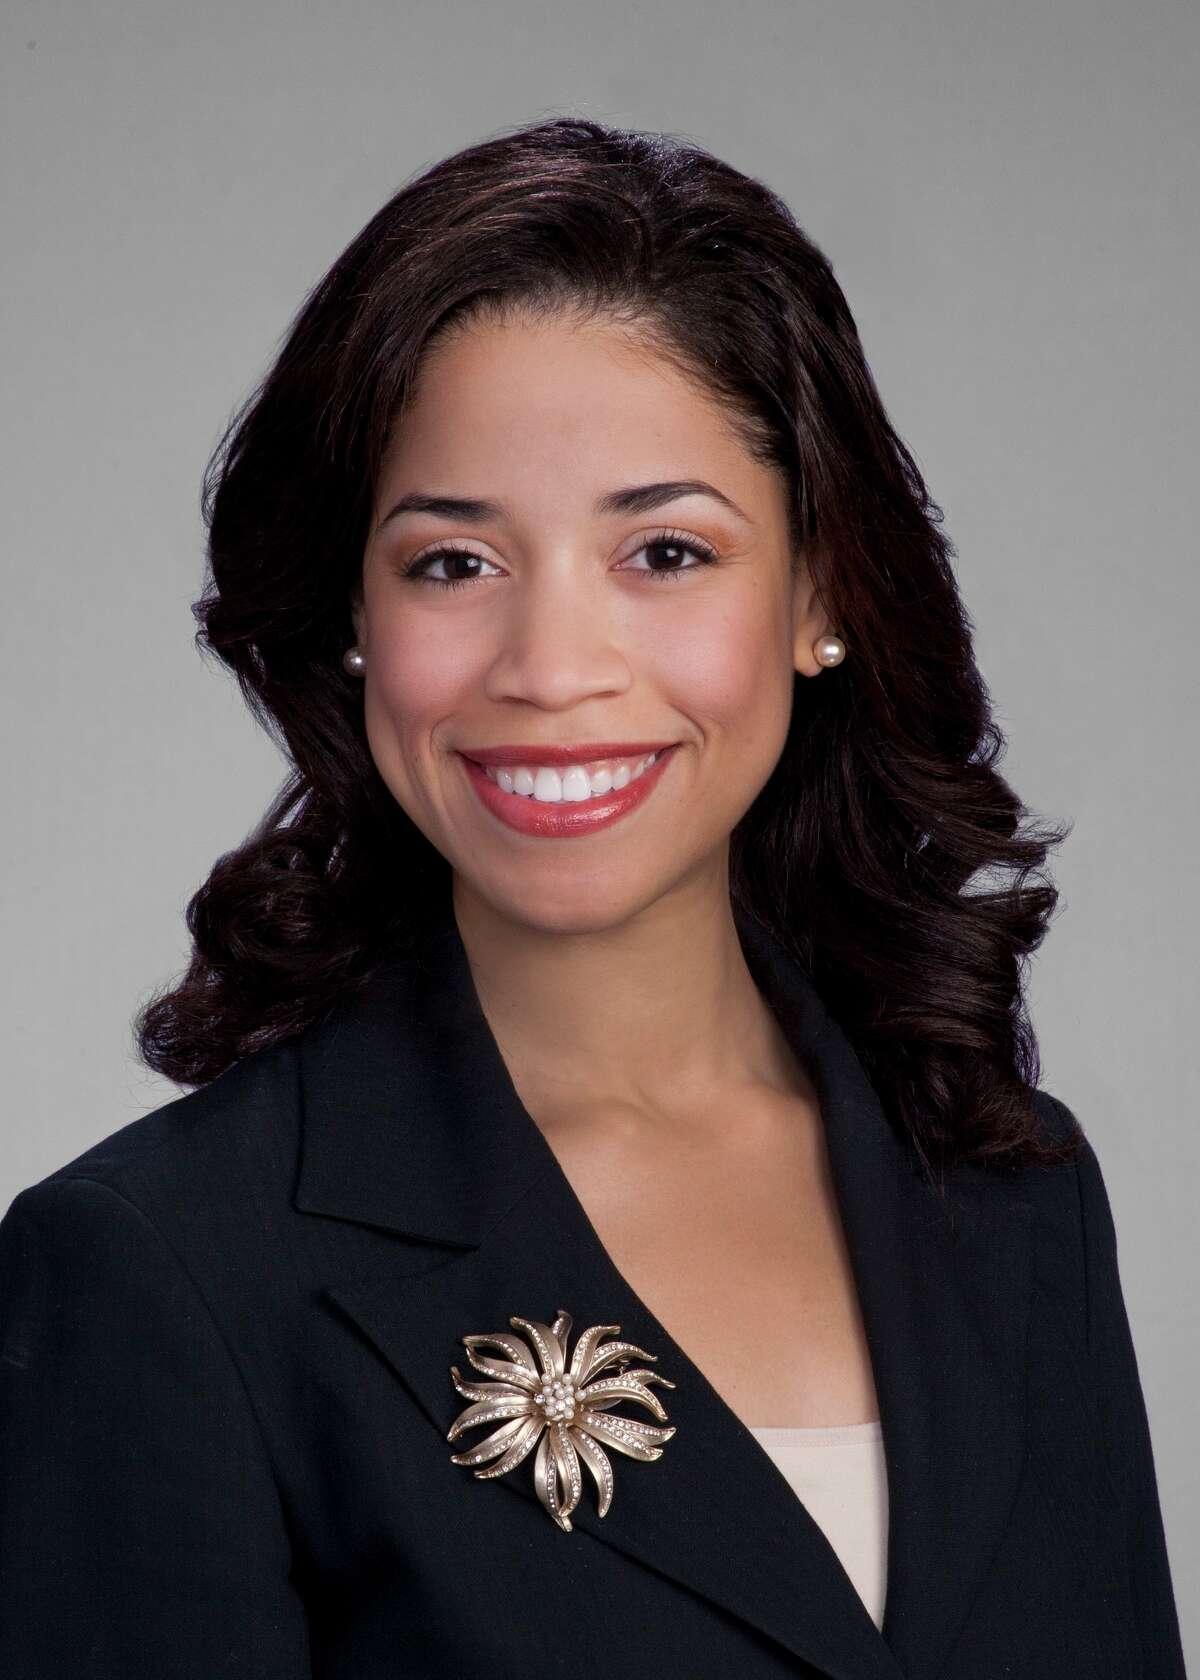 Amanda Edwards, City Council At-Large Position 4